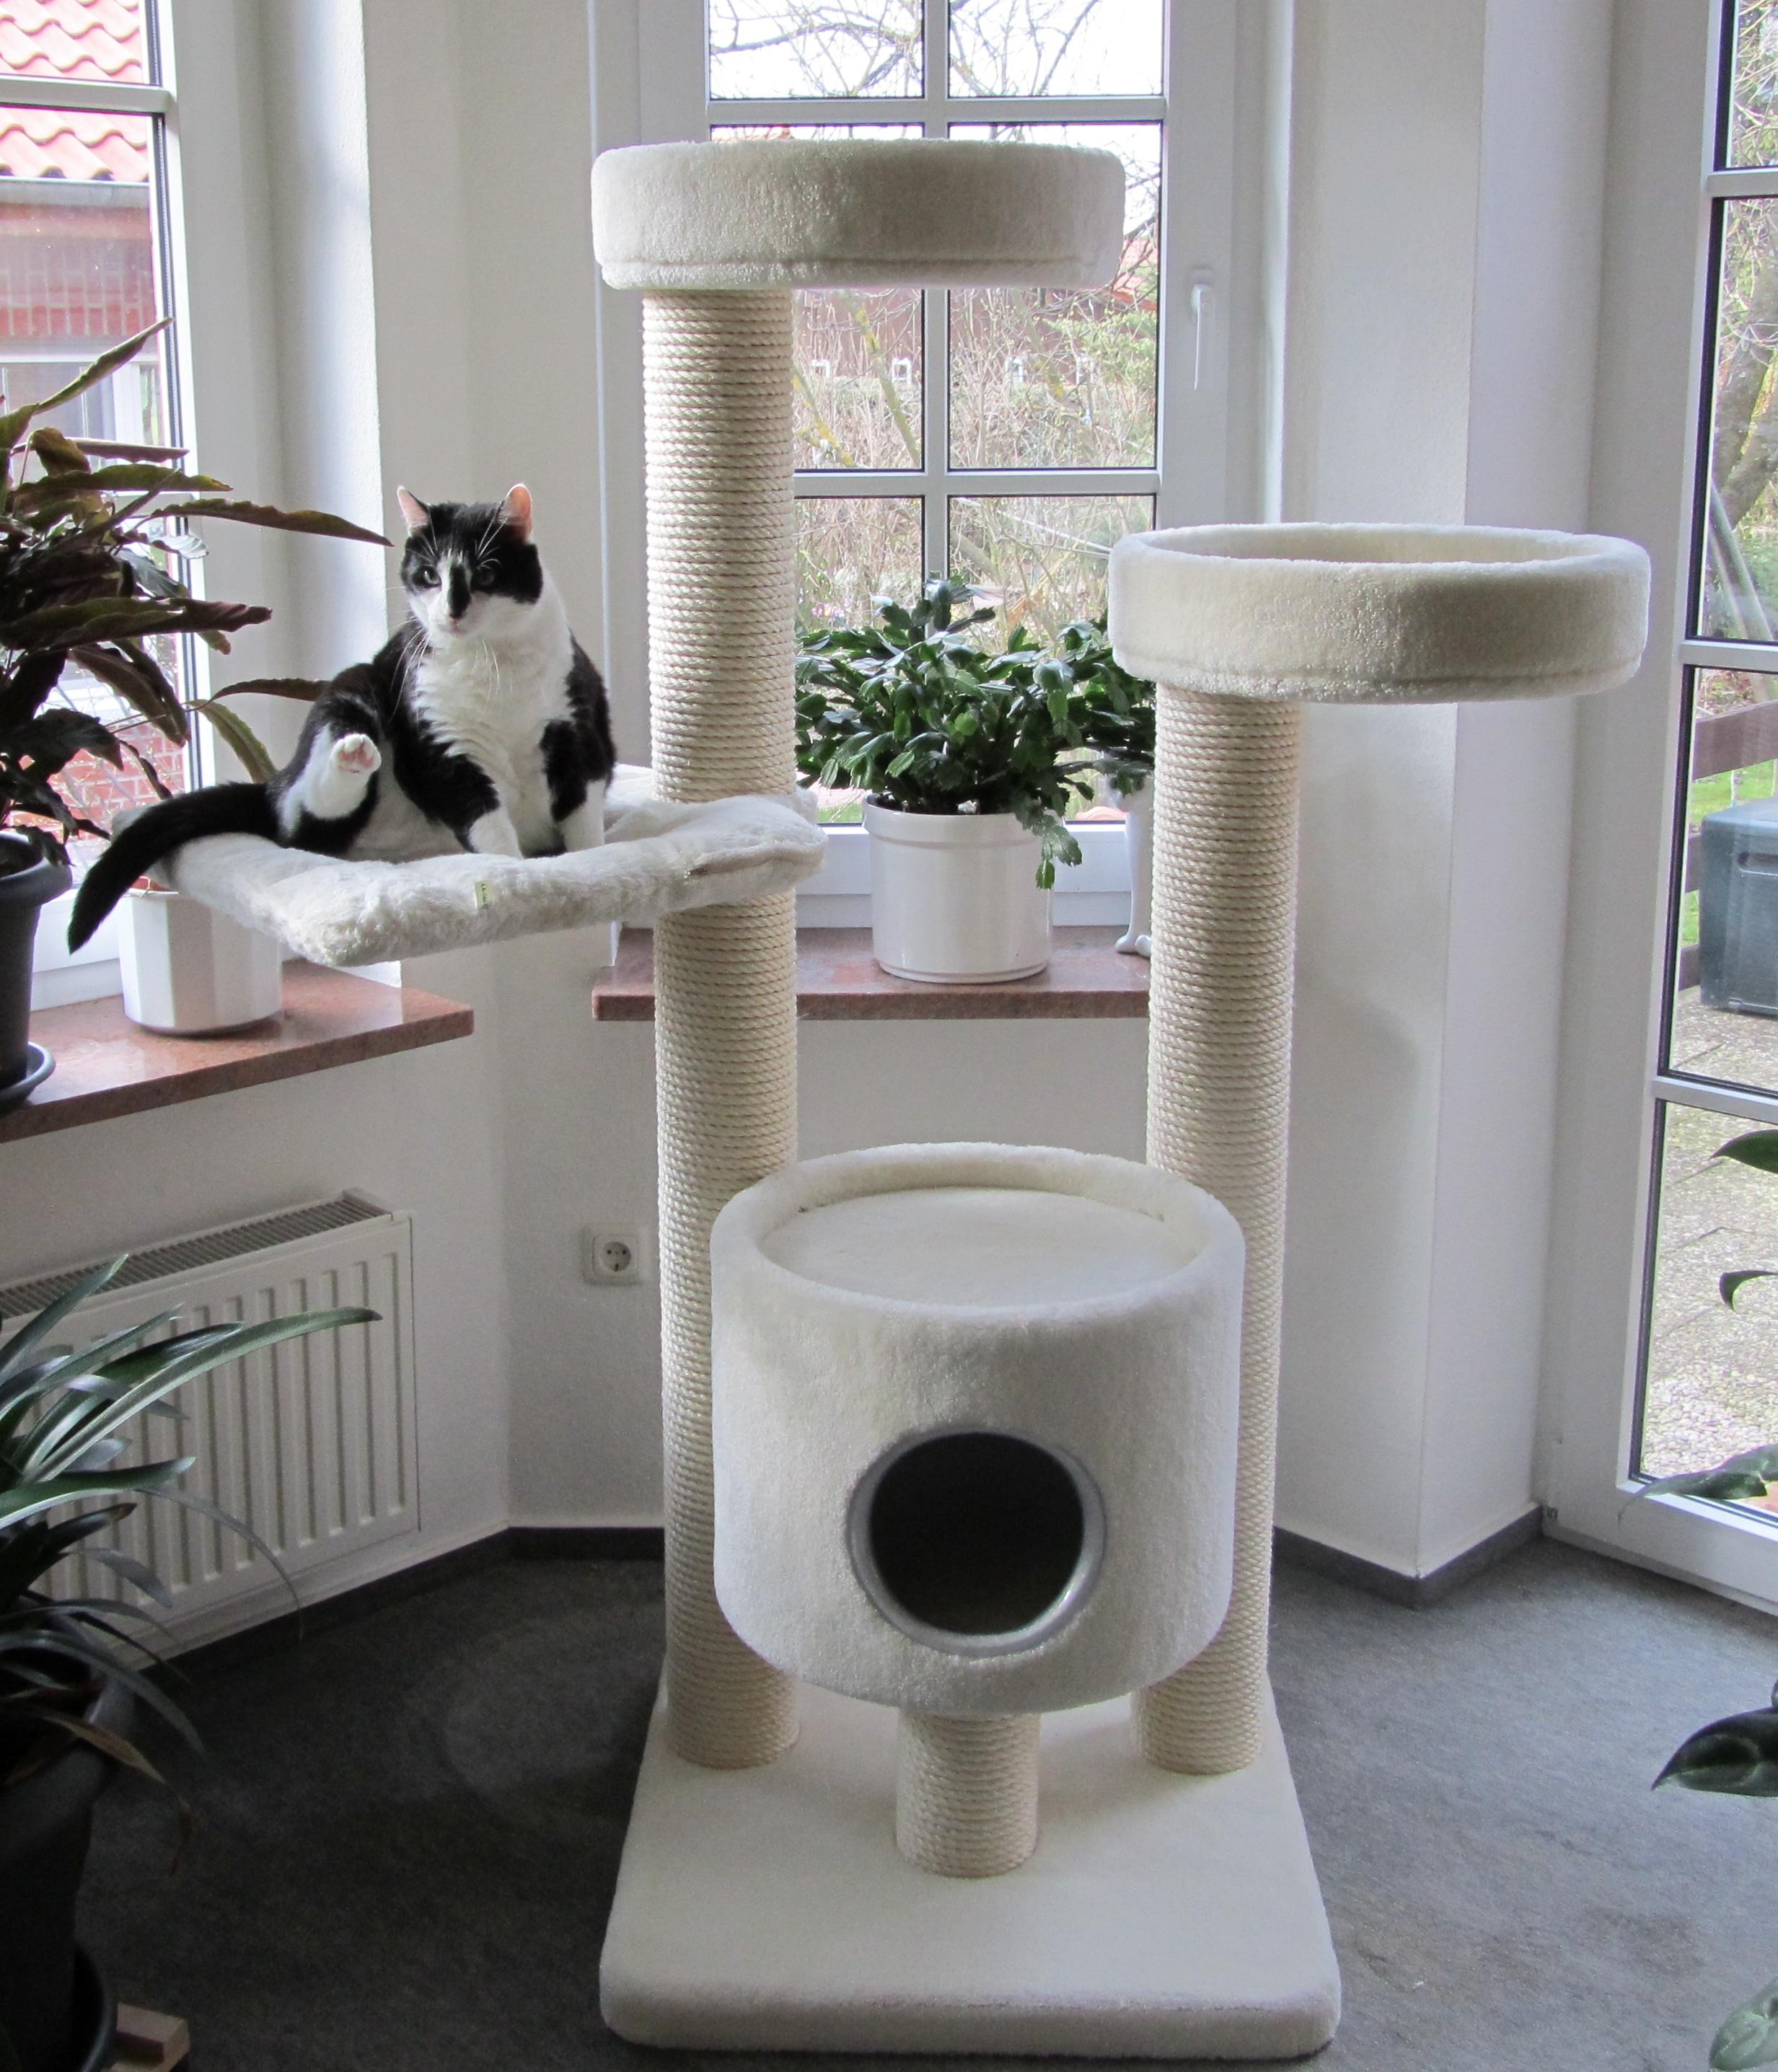 kirstins heimtier shop kratzbaum t11 hm. Black Bedroom Furniture Sets. Home Design Ideas